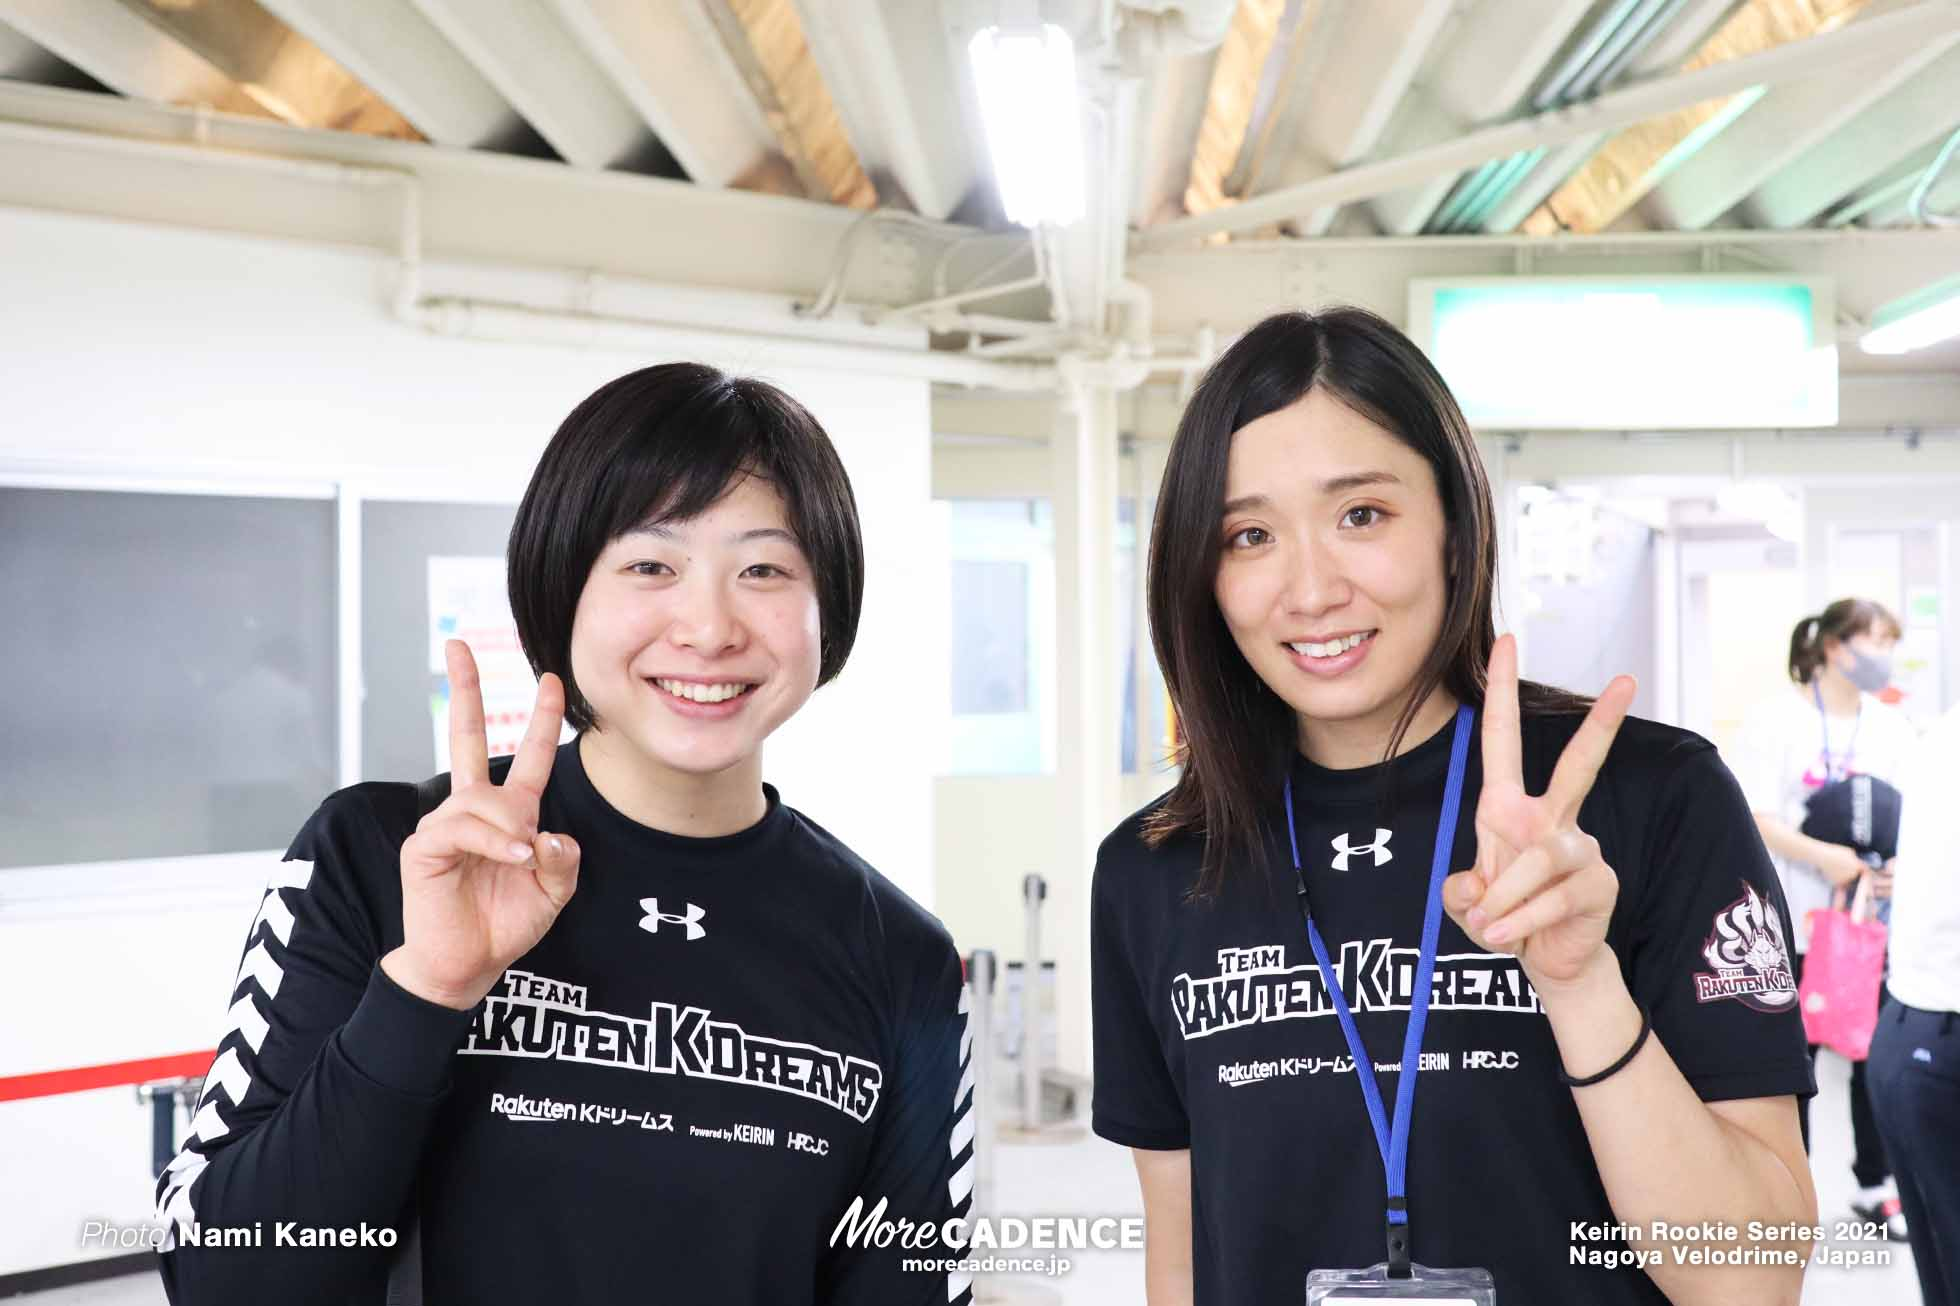 内野艶和 吉川美穂 競輪ルーキーシリーズ2021, 名古屋競輪場